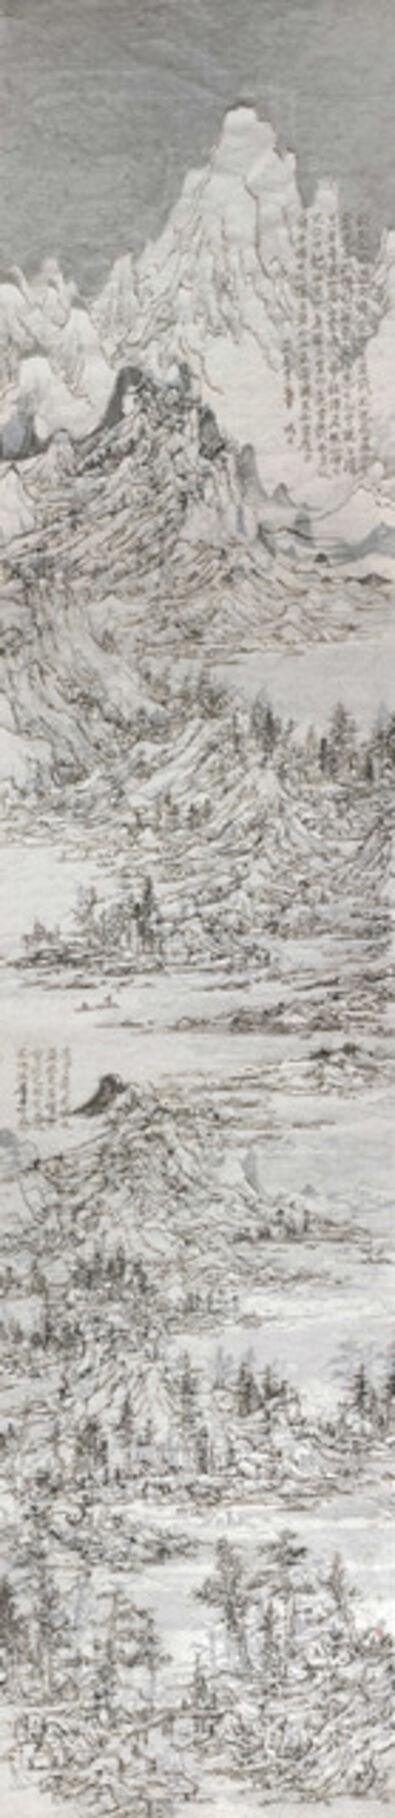 Wang Tiande 王天德, 'After the Snow 雪後', 2018